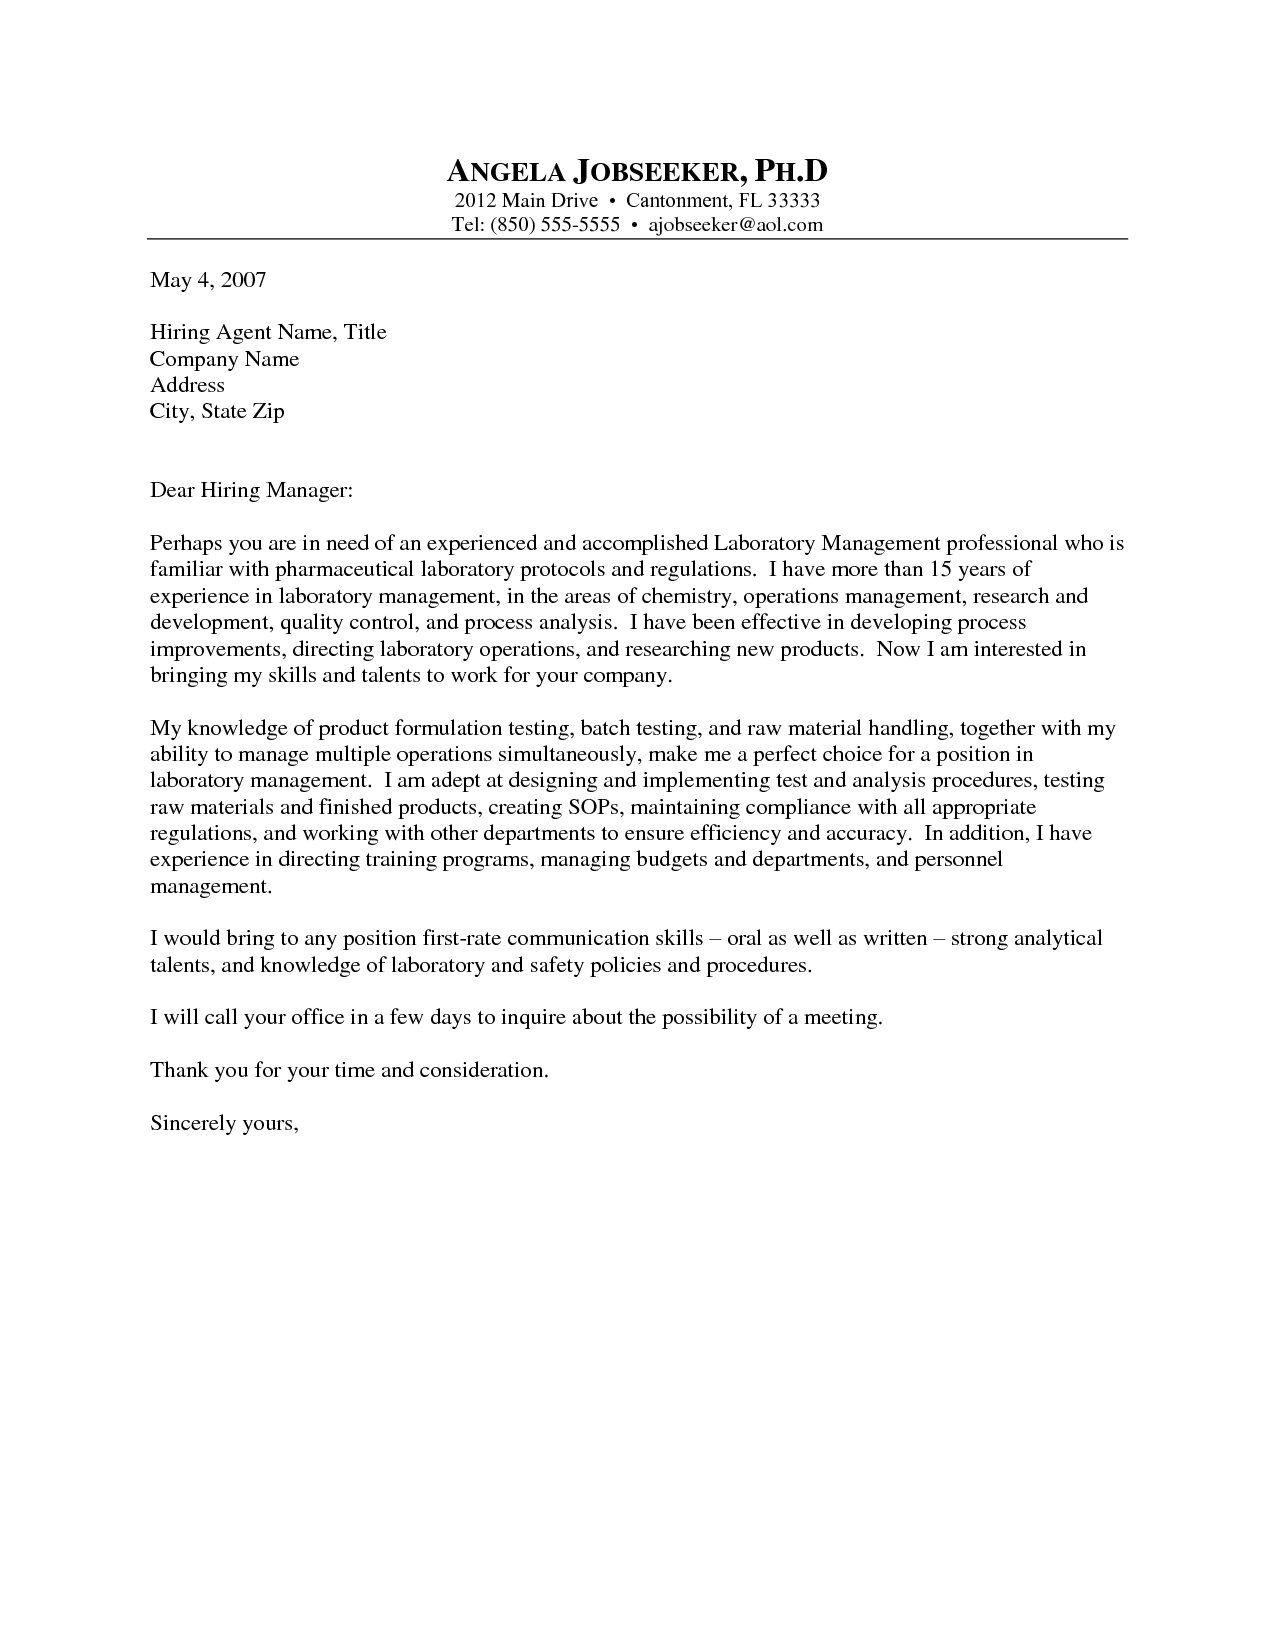 Cover Letter Template Lpn Resume Format Cover Letter For Resume Teaching Cover Letter Cover Letter Teacher